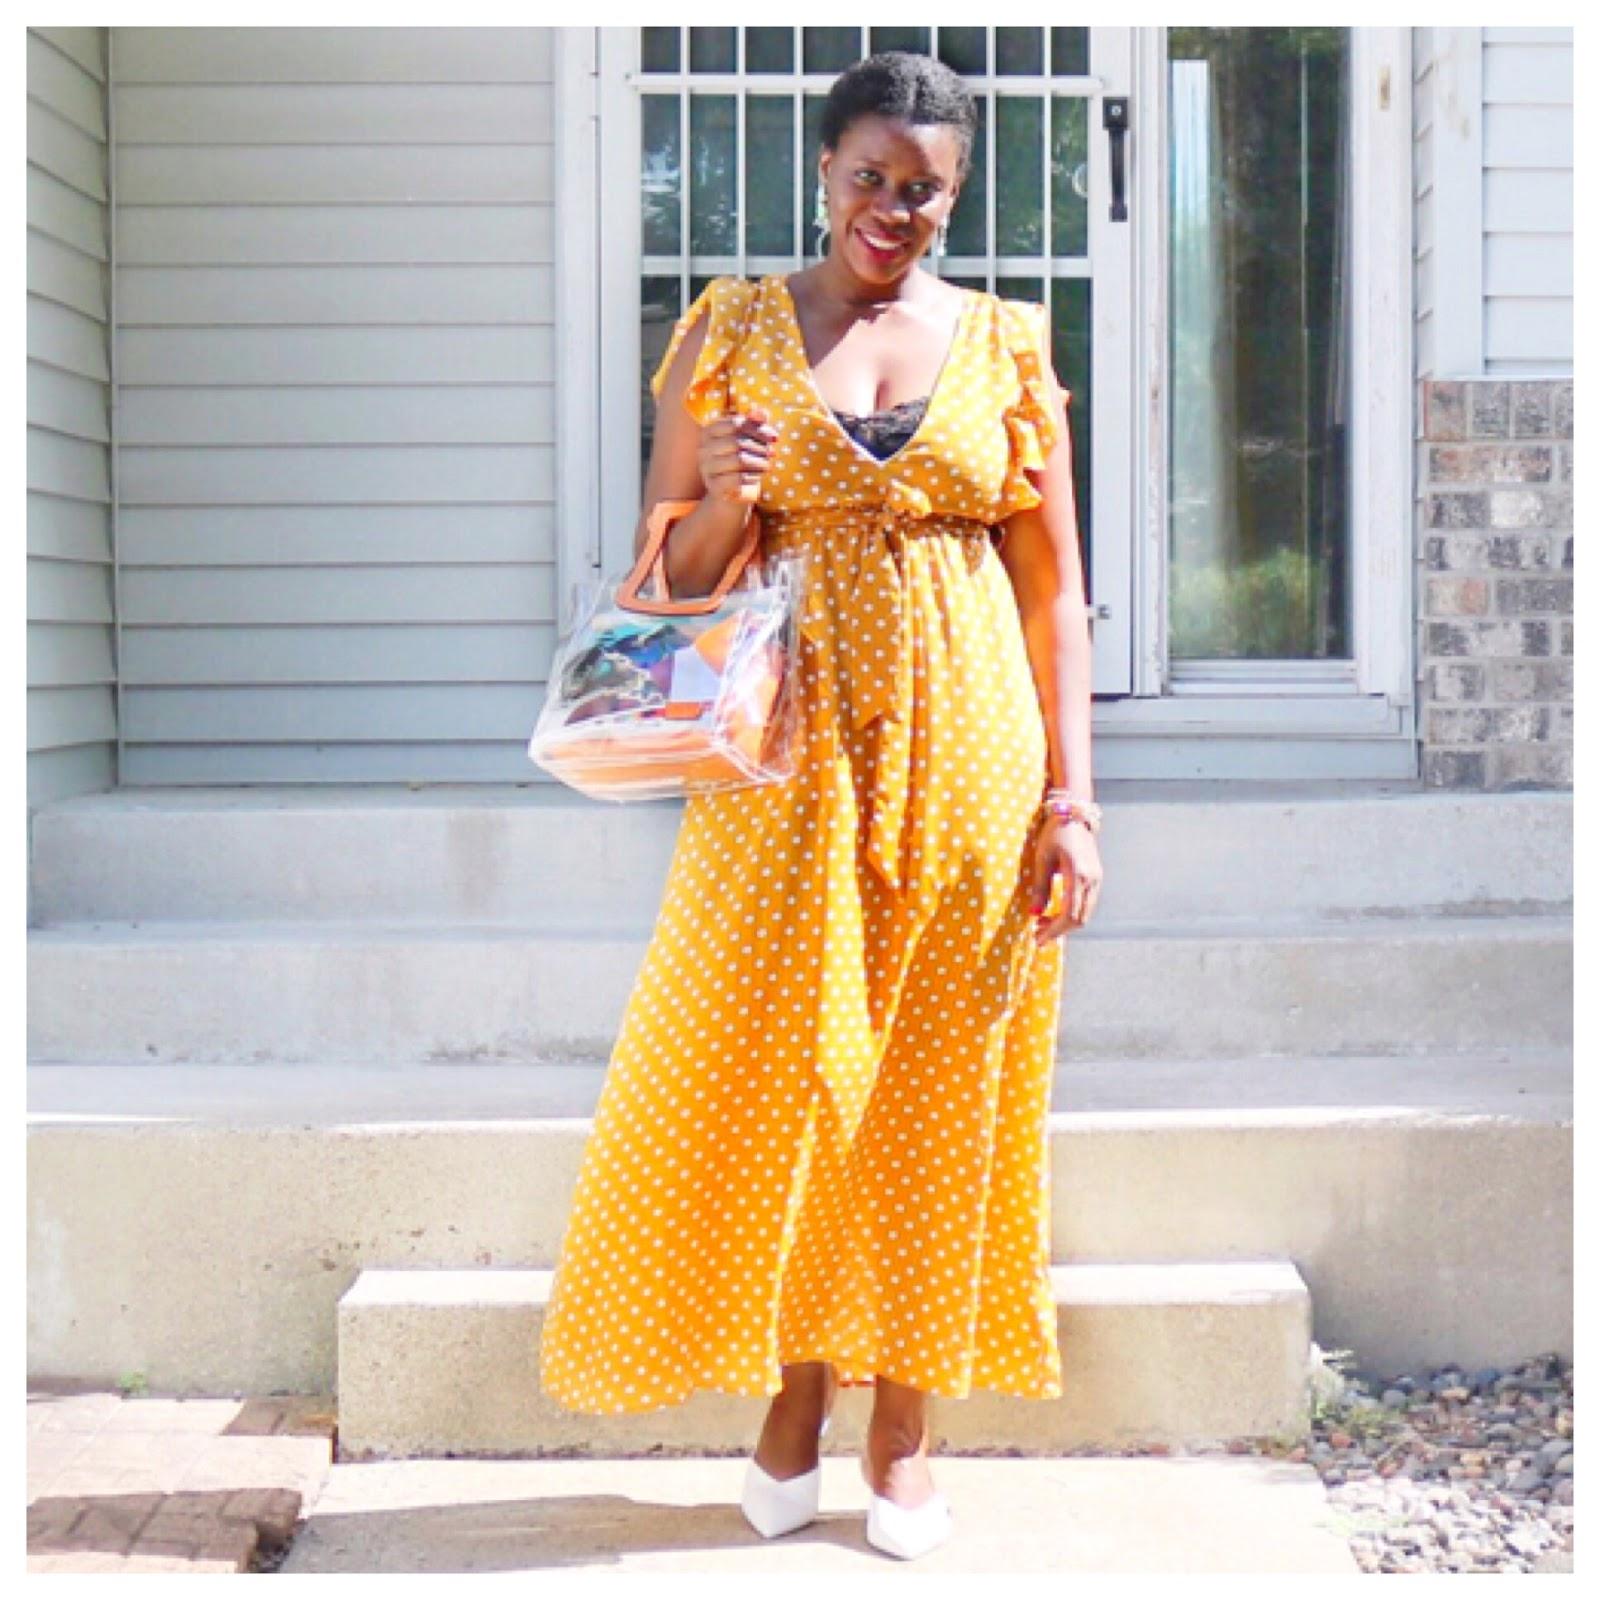 Fashion Beauty Zone: Beauty's Fashion Zone: Yellow Polka Dots Maxi Dress